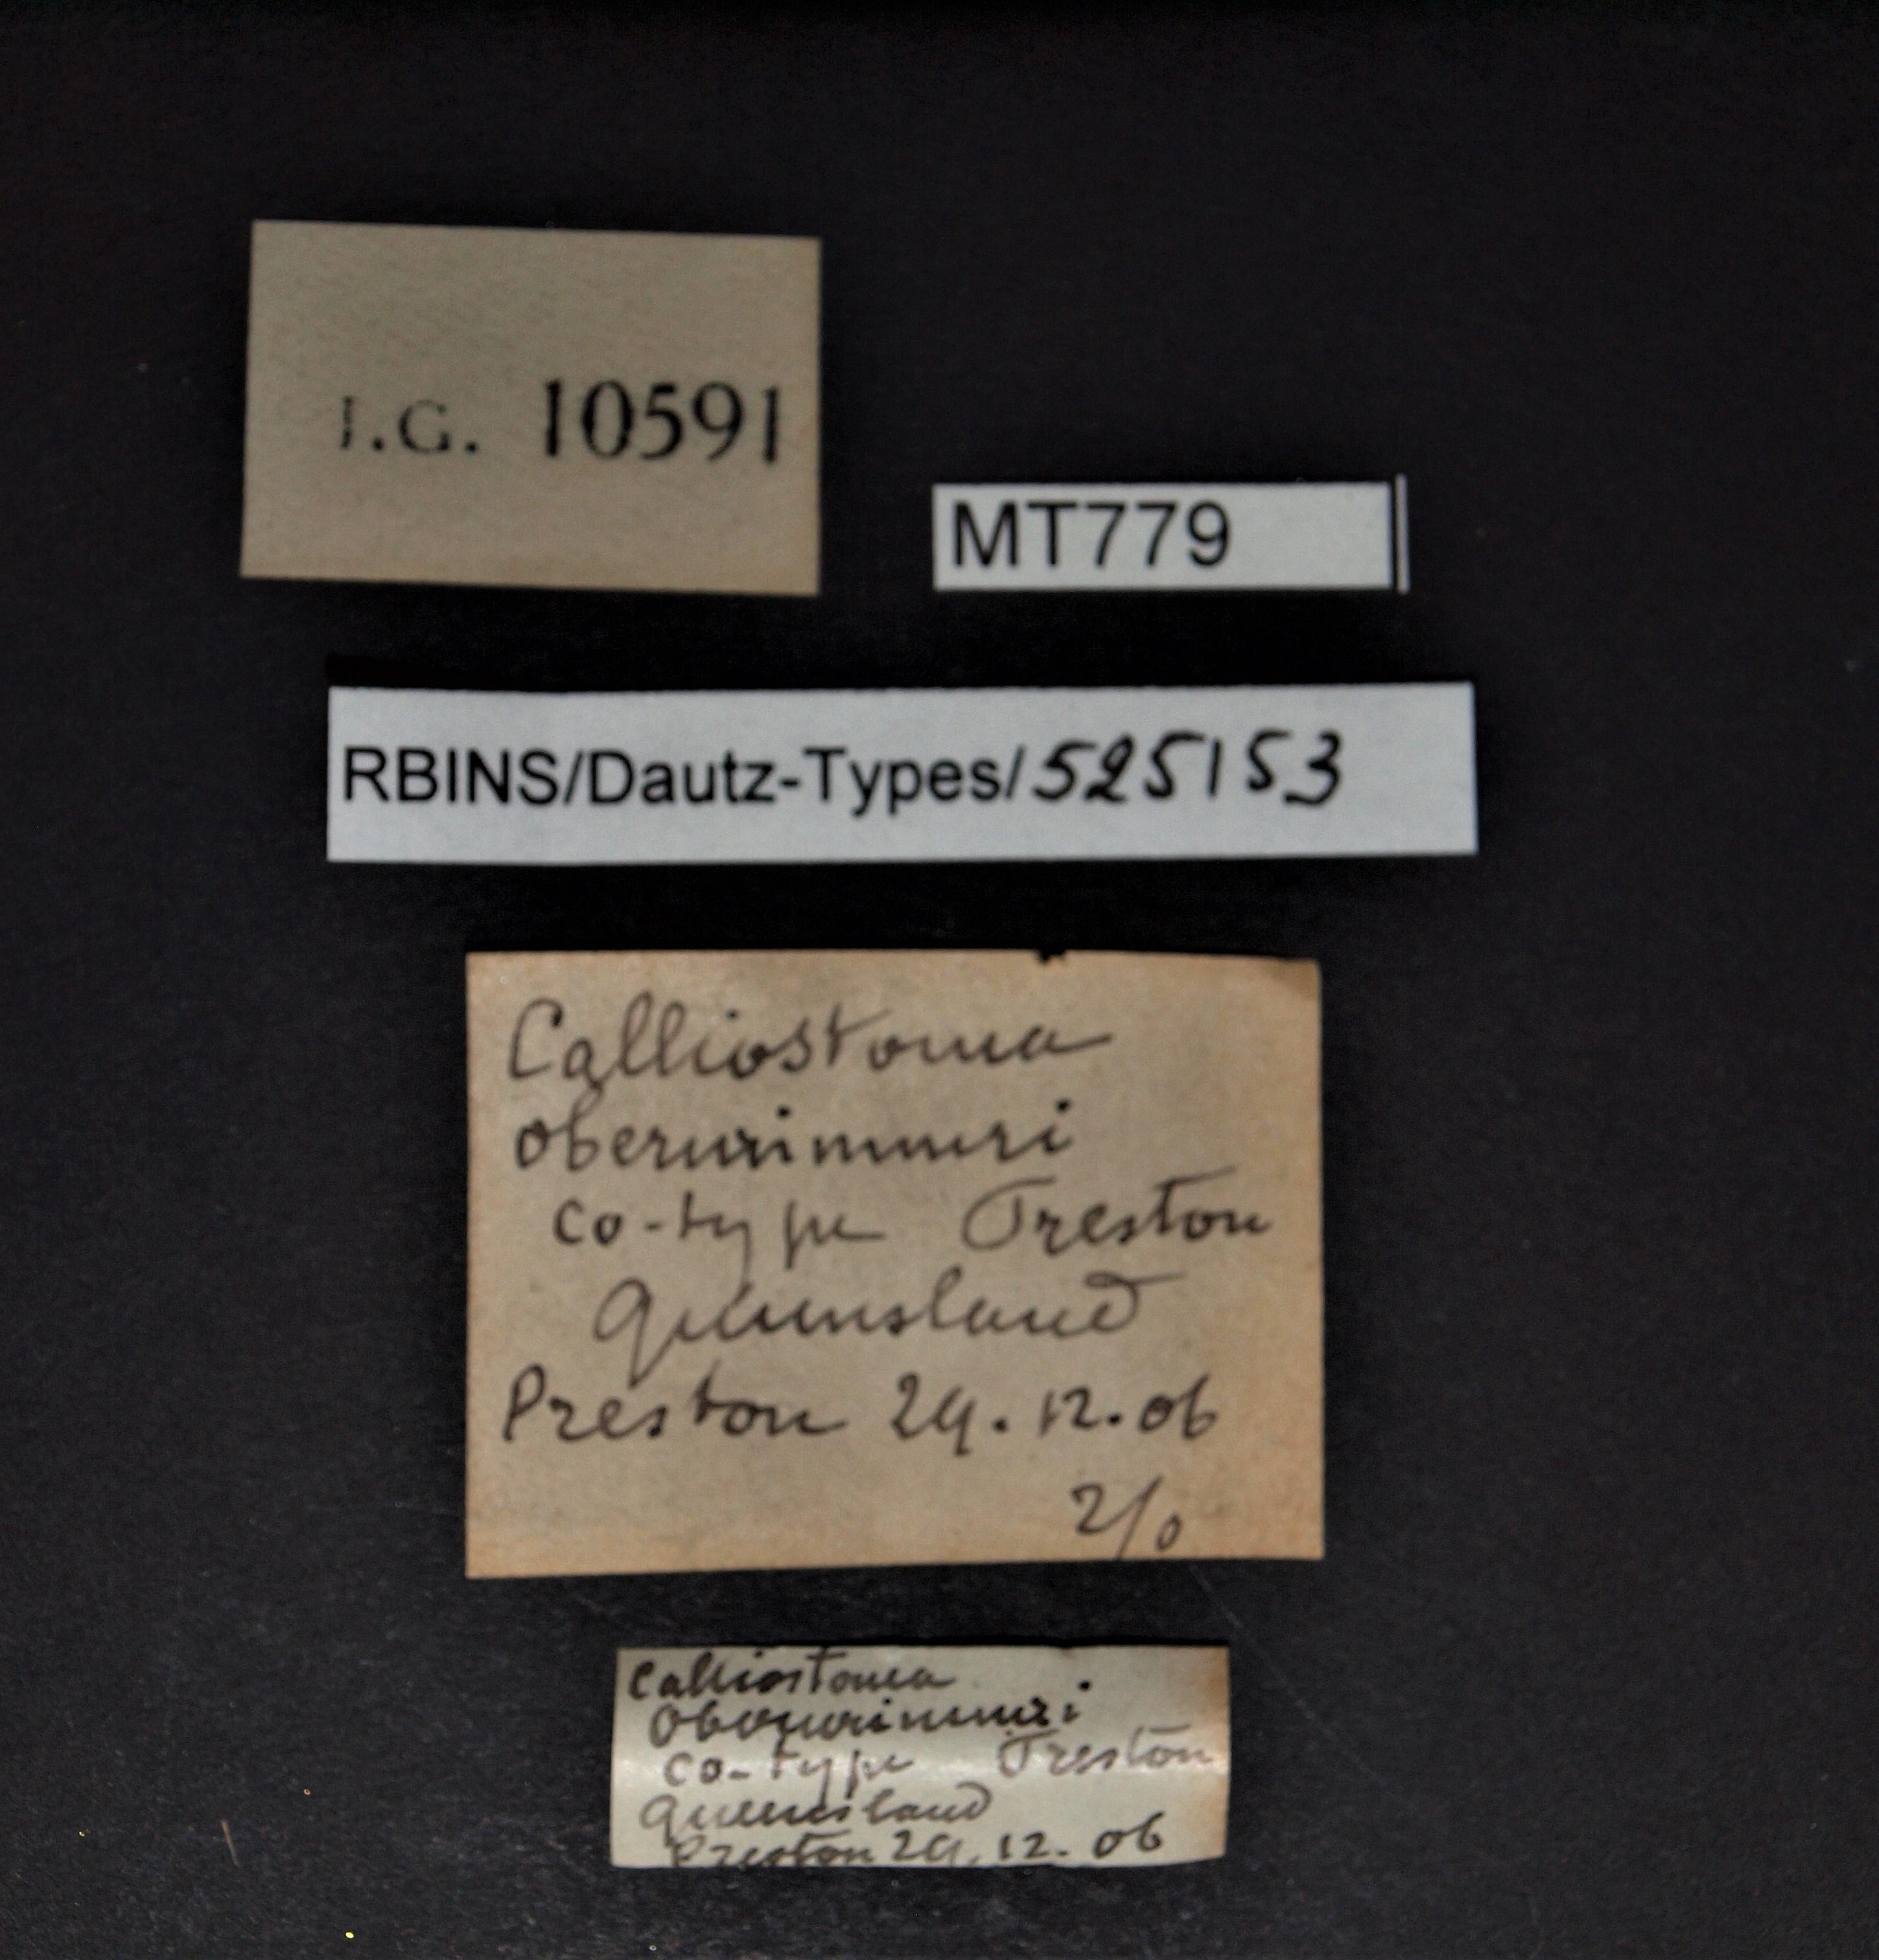 BE-RBINS-INV MT 779 Calliostoma oberwimmeri pt Lb.JPG